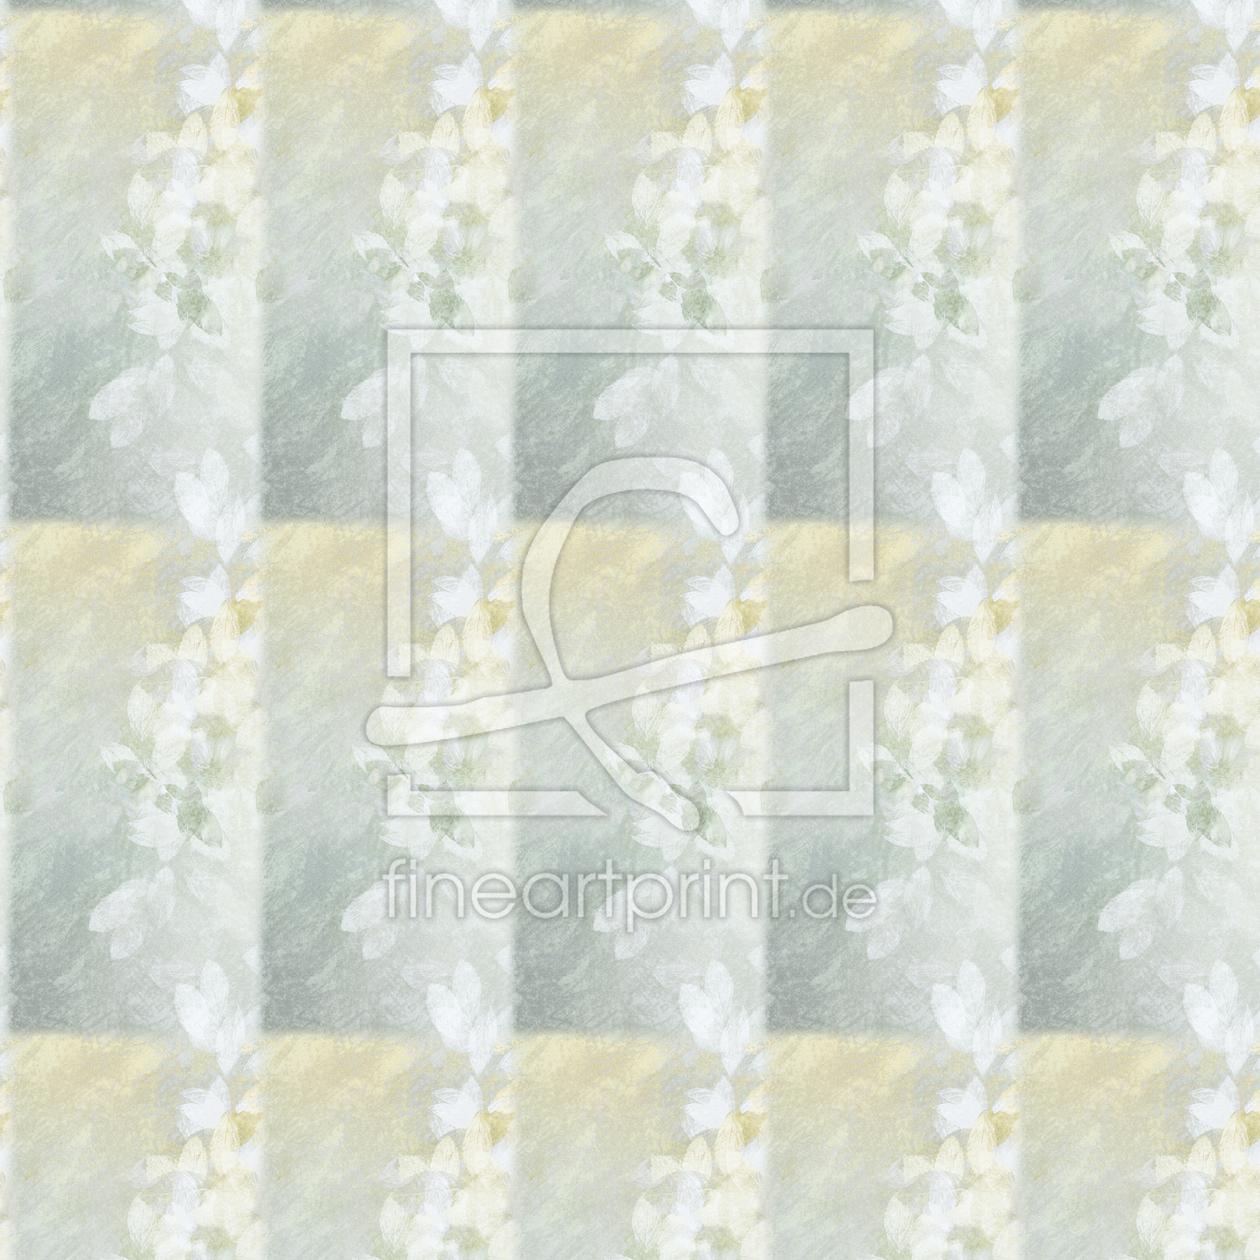 tapete pastell als metalldruck 10556785 fine art prin. Black Bedroom Furniture Sets. Home Design Ideas